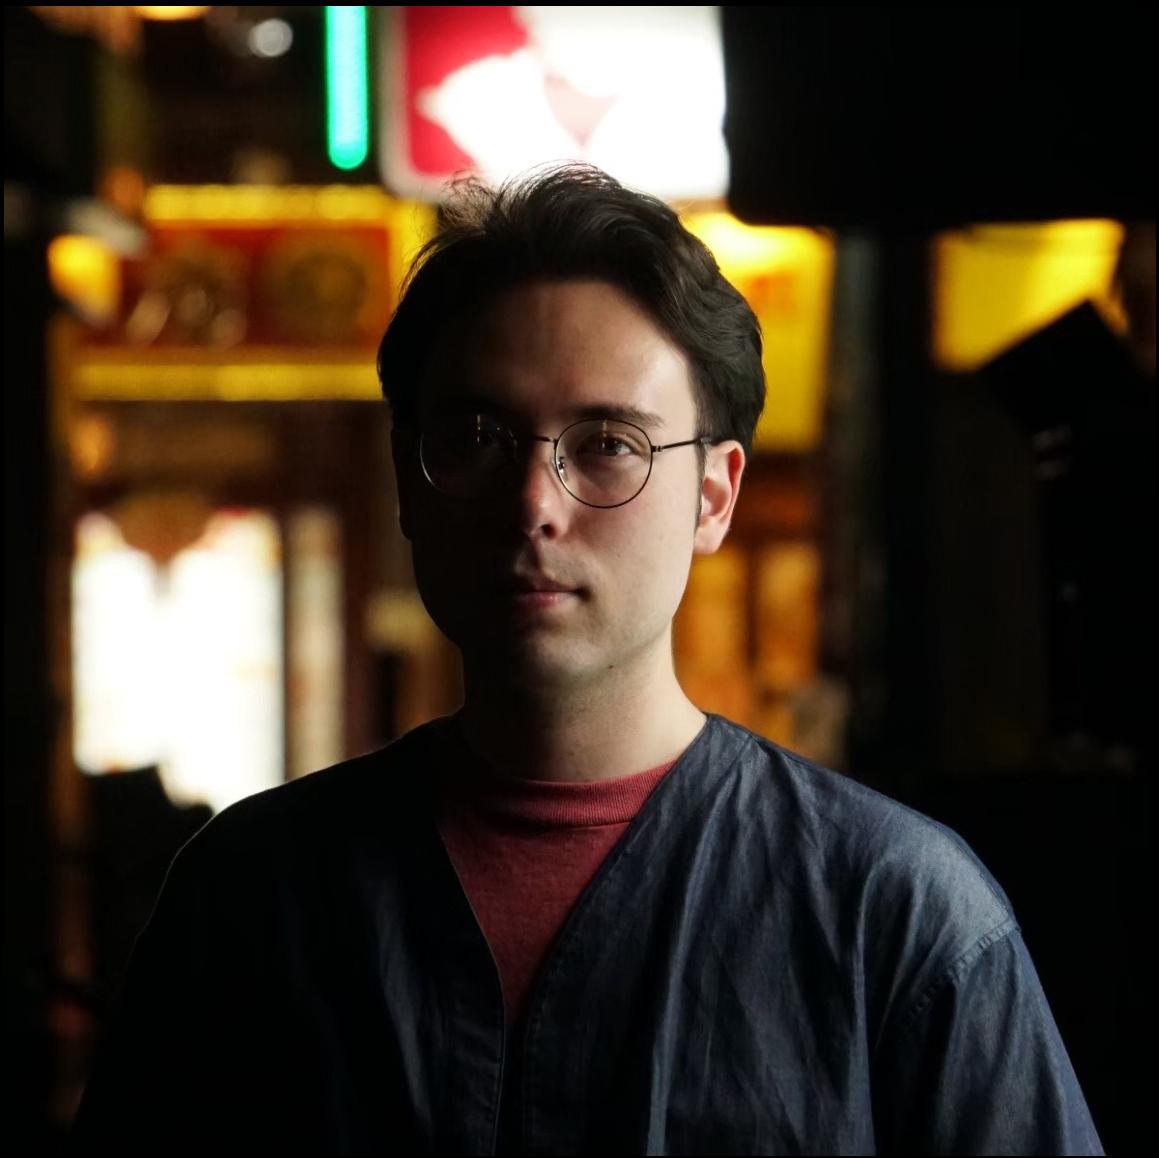 Kyle Yamada